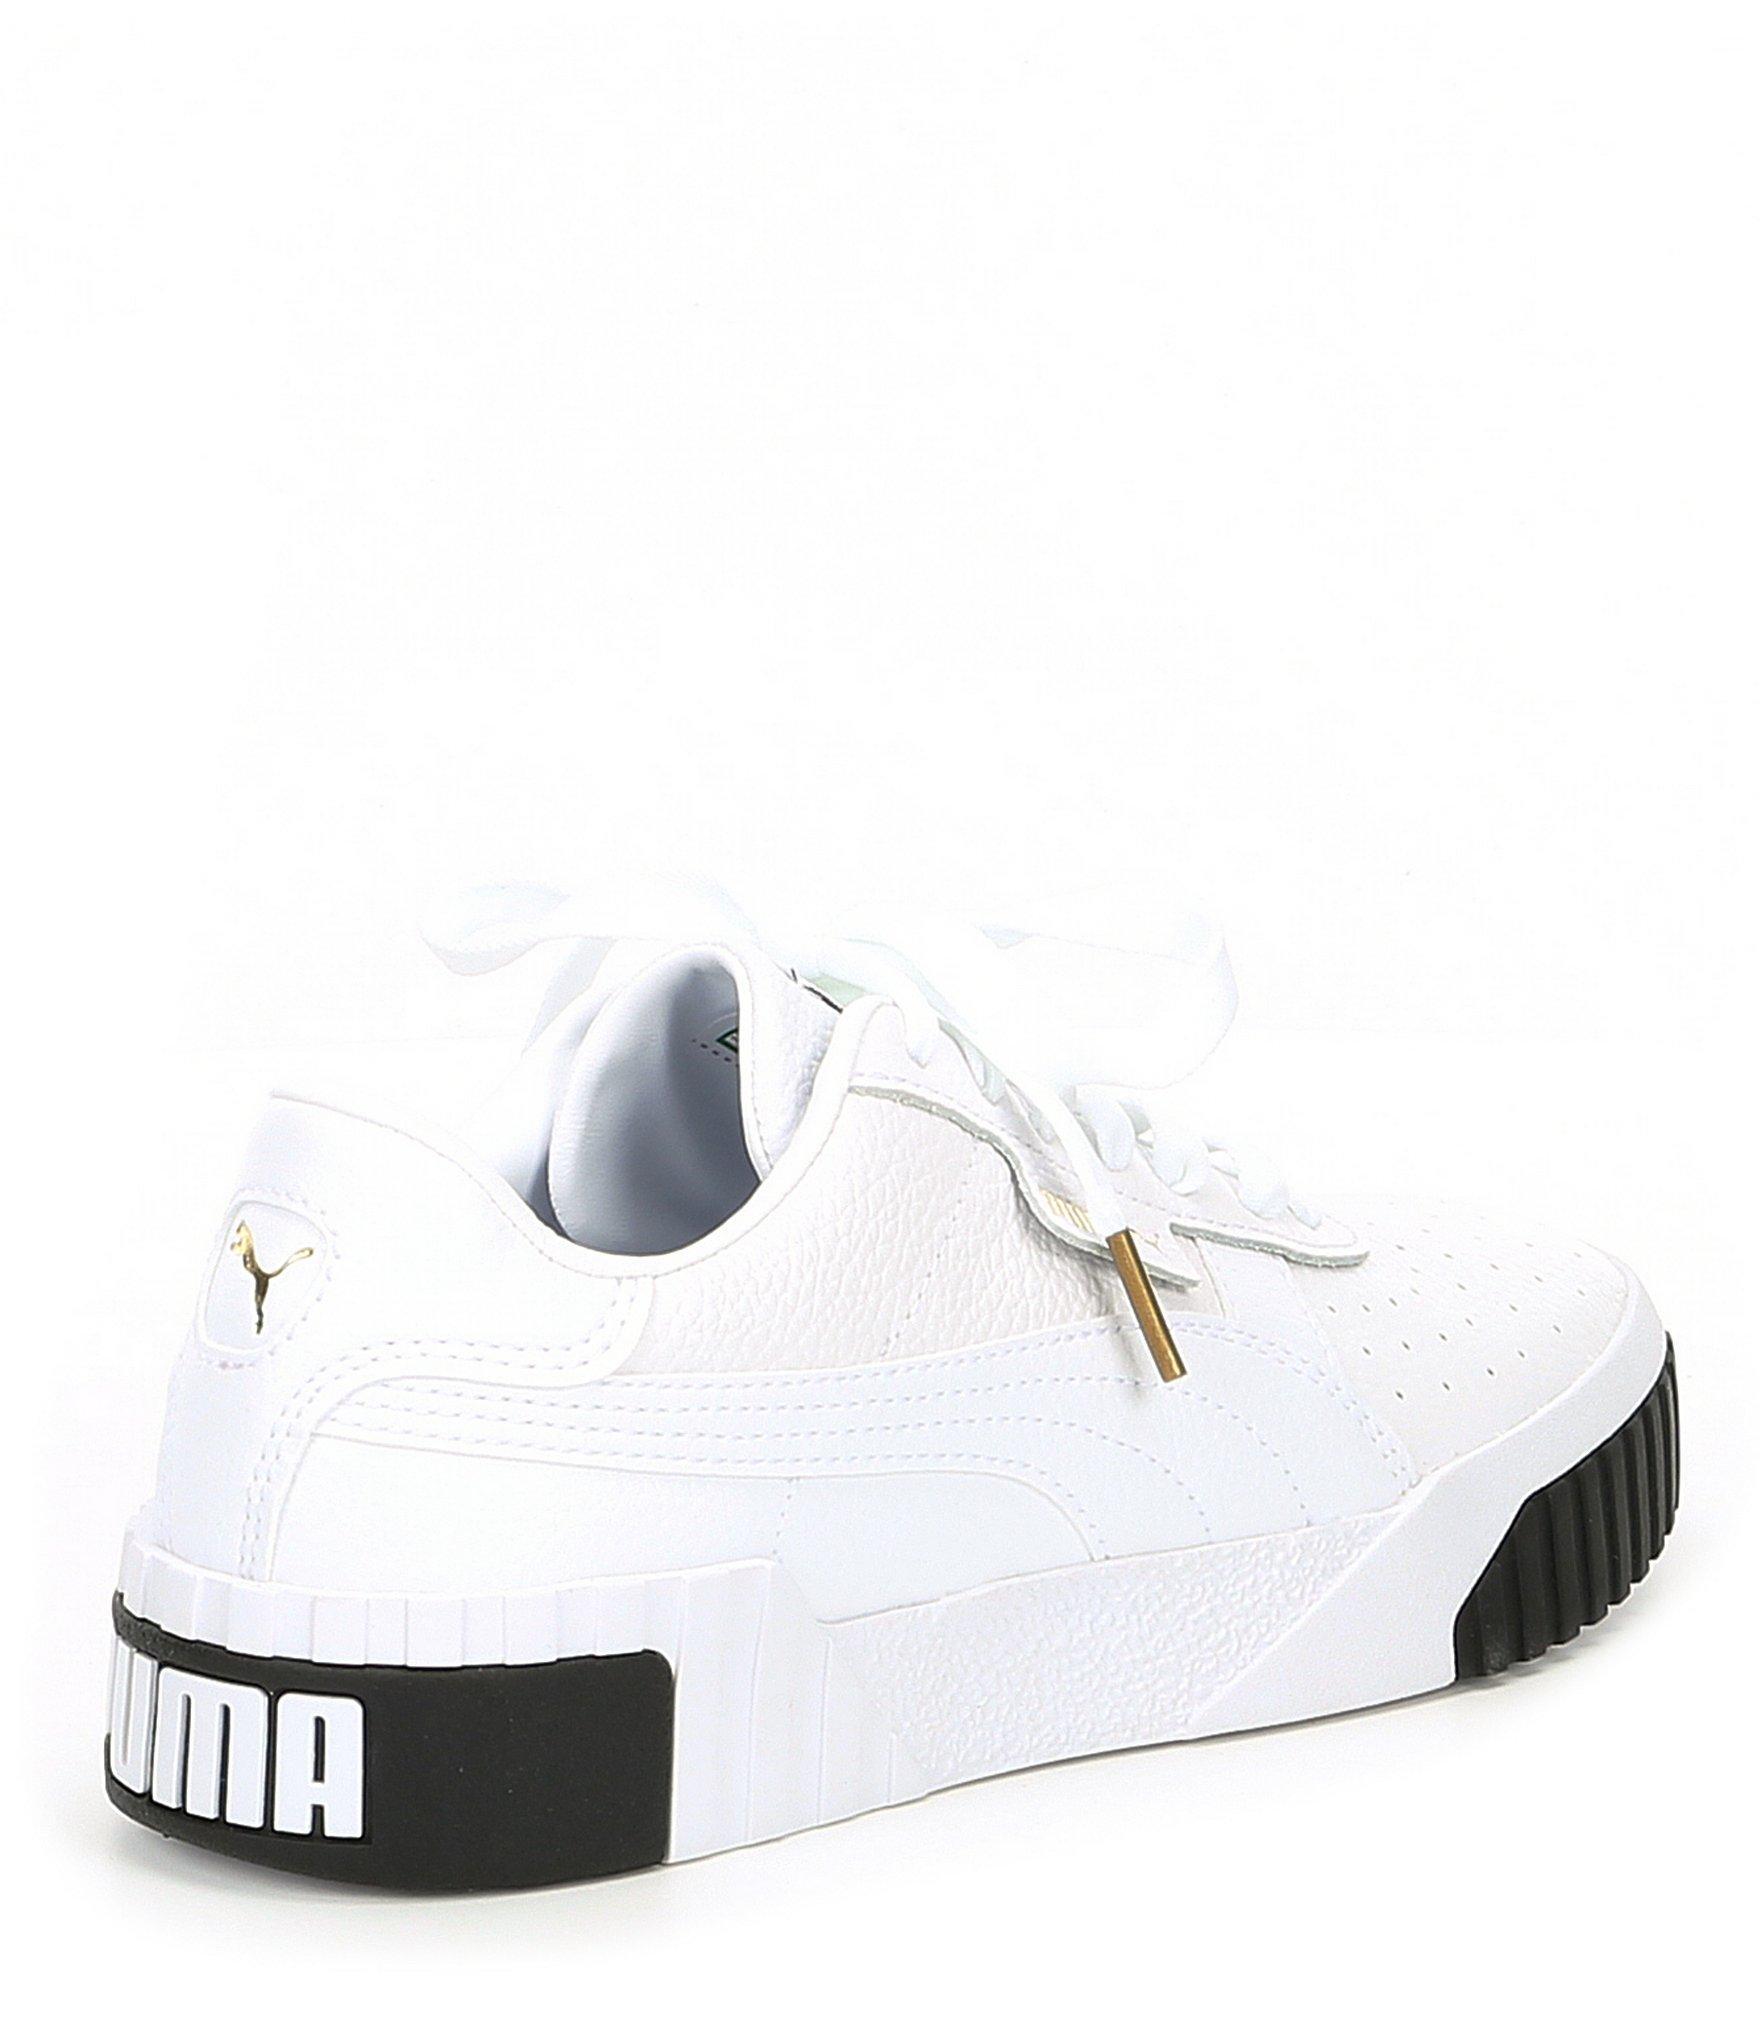 PUMA - White Women s Cali Leather Sneakers - Lyst. View fullscreen 97280db69